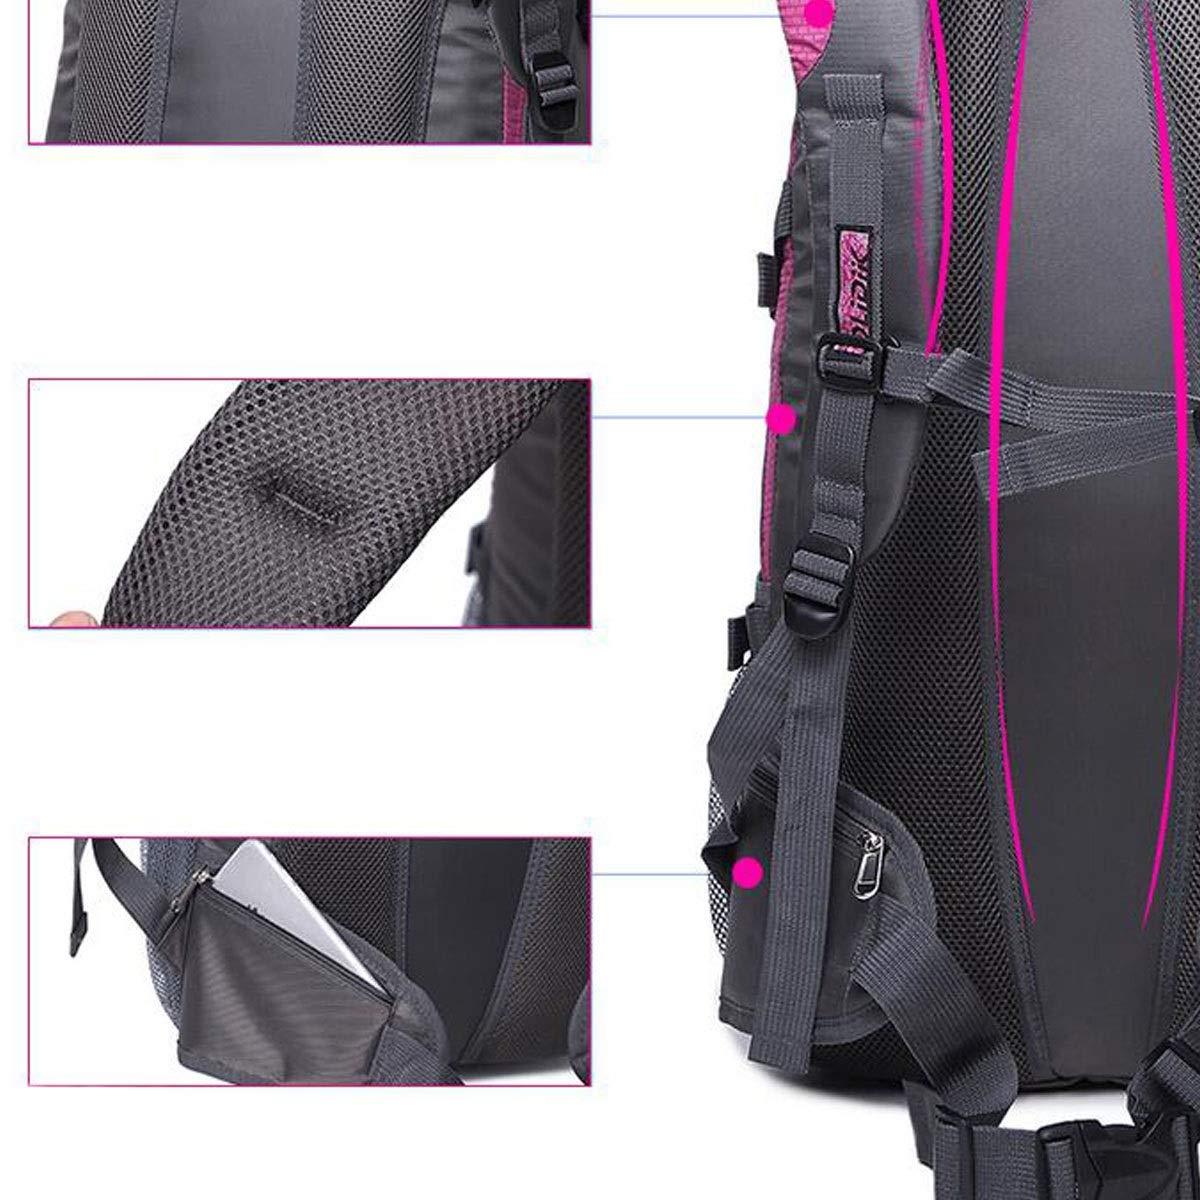 Color : ArmyGreen Blue Leisure Travel Light Waterproof Outdoor Mountaineering Bag 30L(Black ArmyGreen Chenjinxiang01 Large-Capacity Backpack Purple Rose Red) Orange